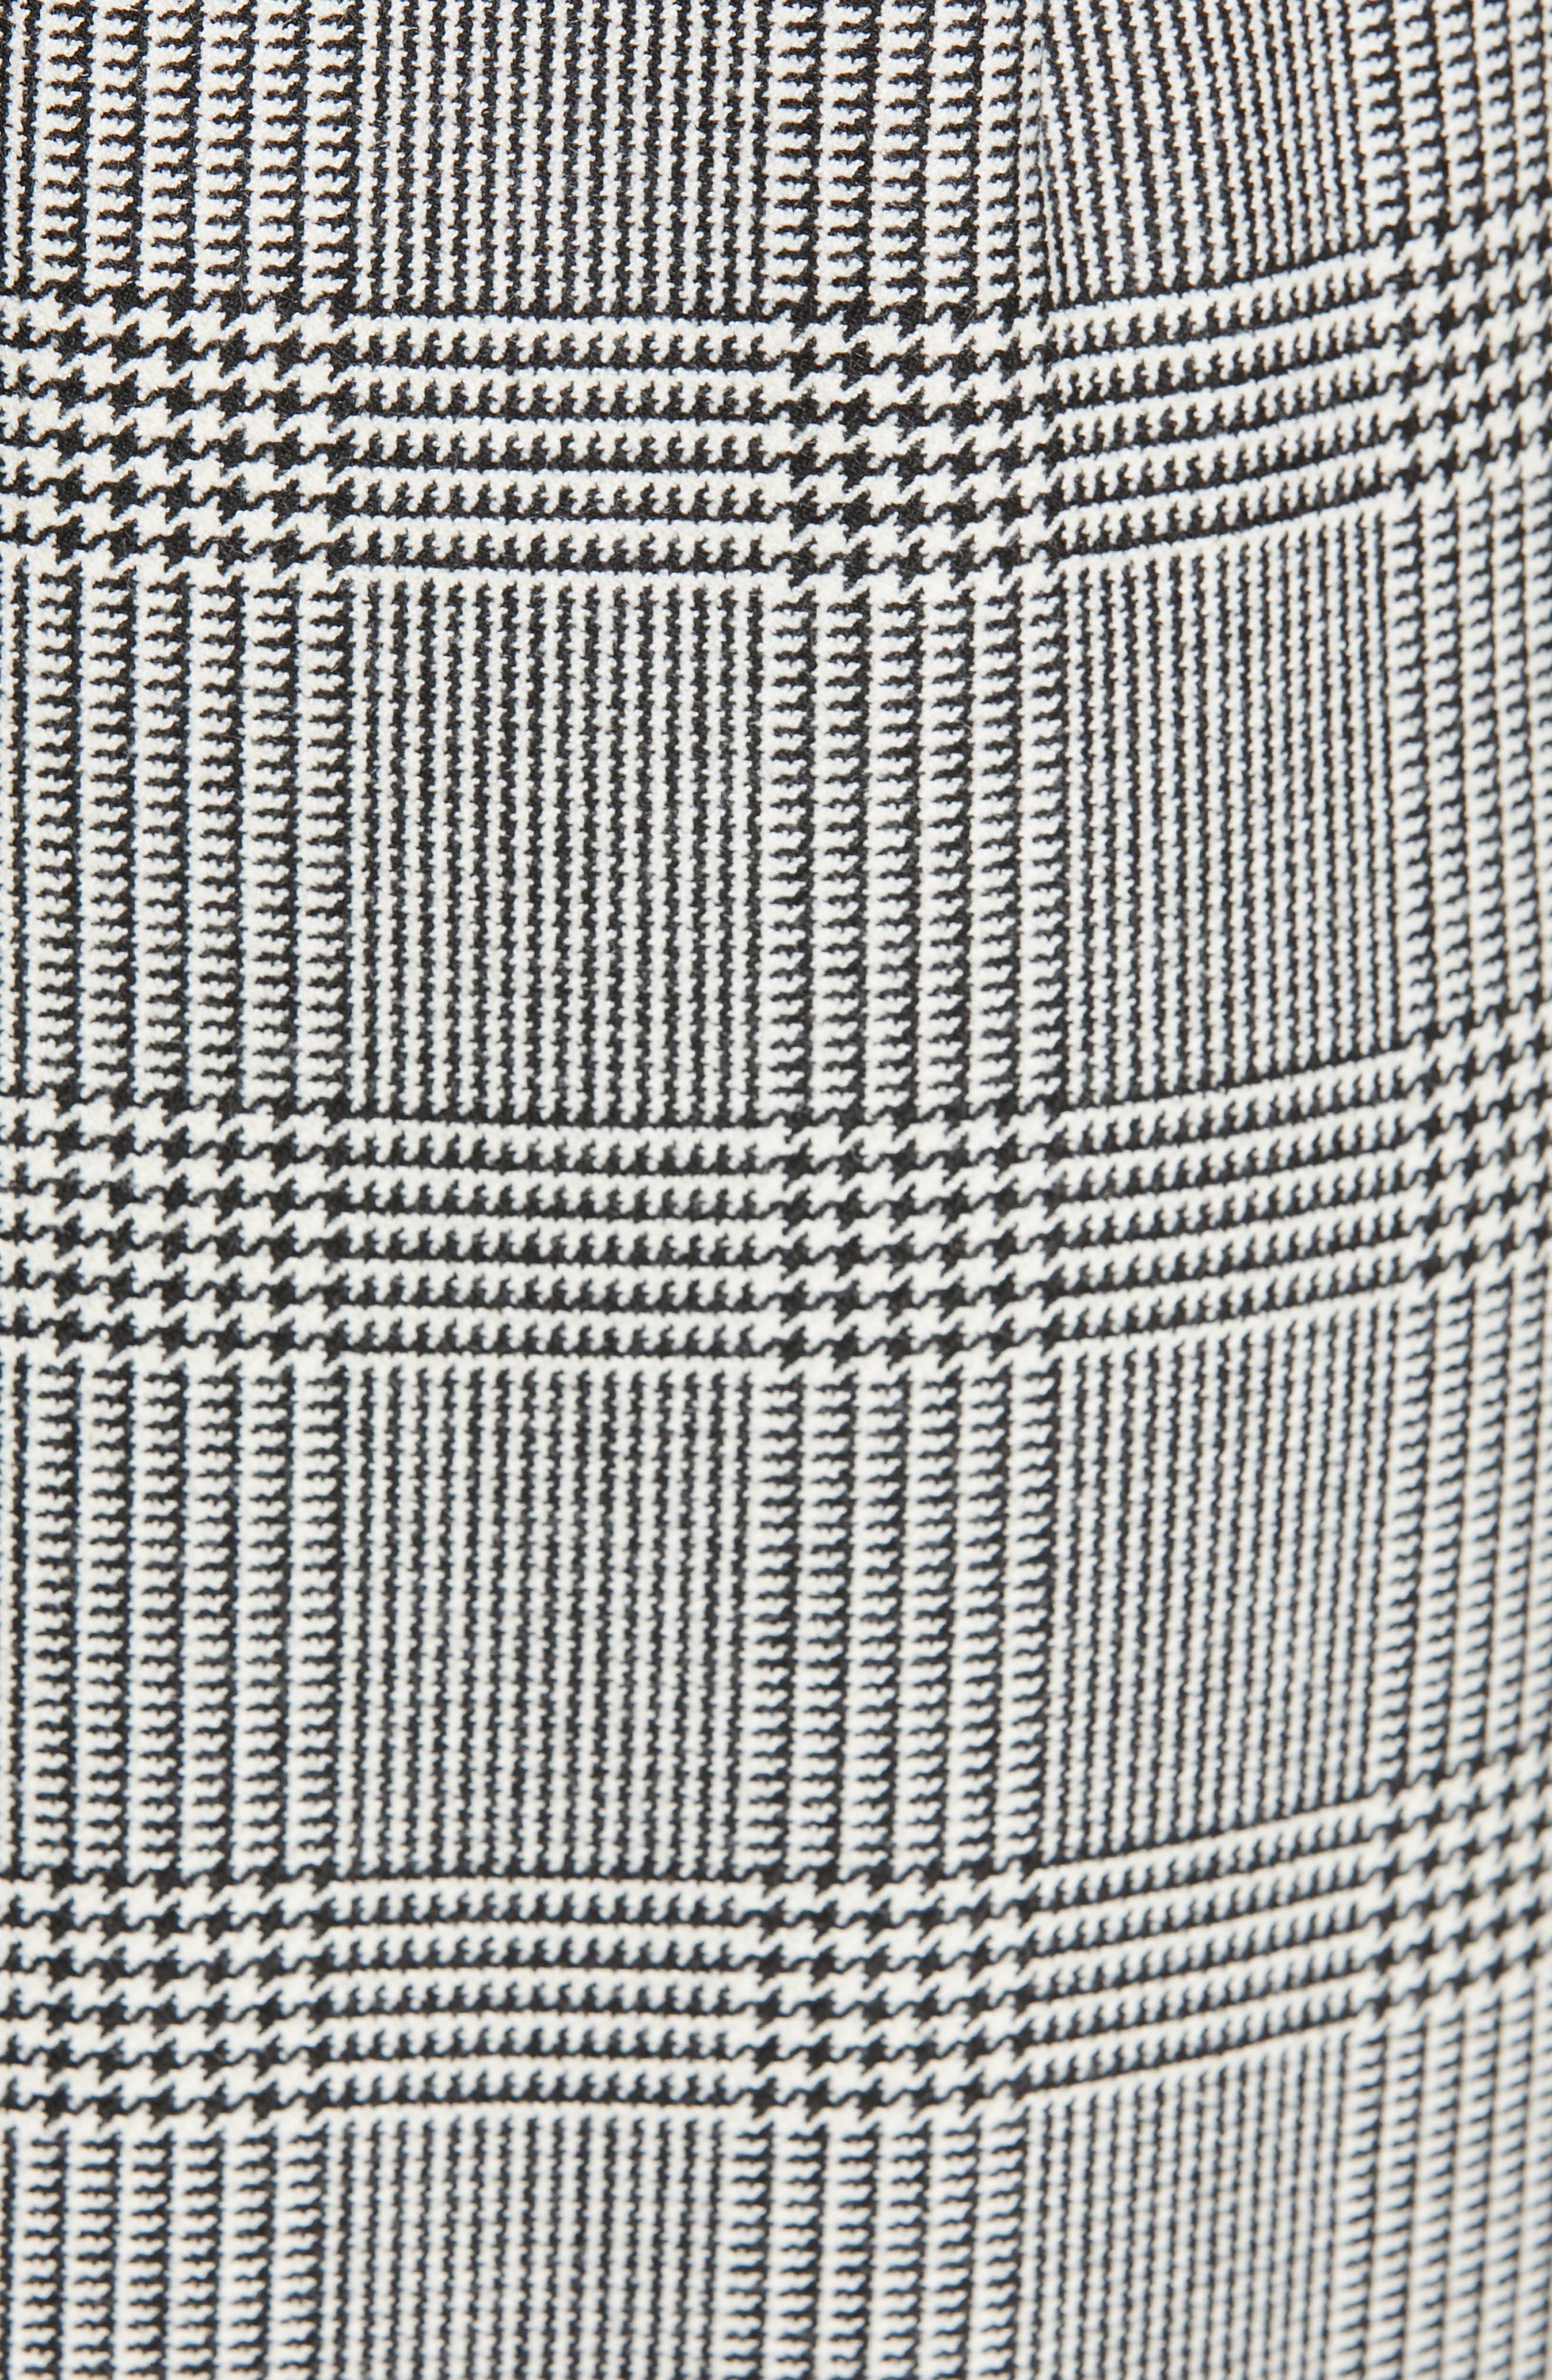 BOSS, Dechesta Glen Plaid Sheath Dress, Alternate thumbnail 6, color, 020